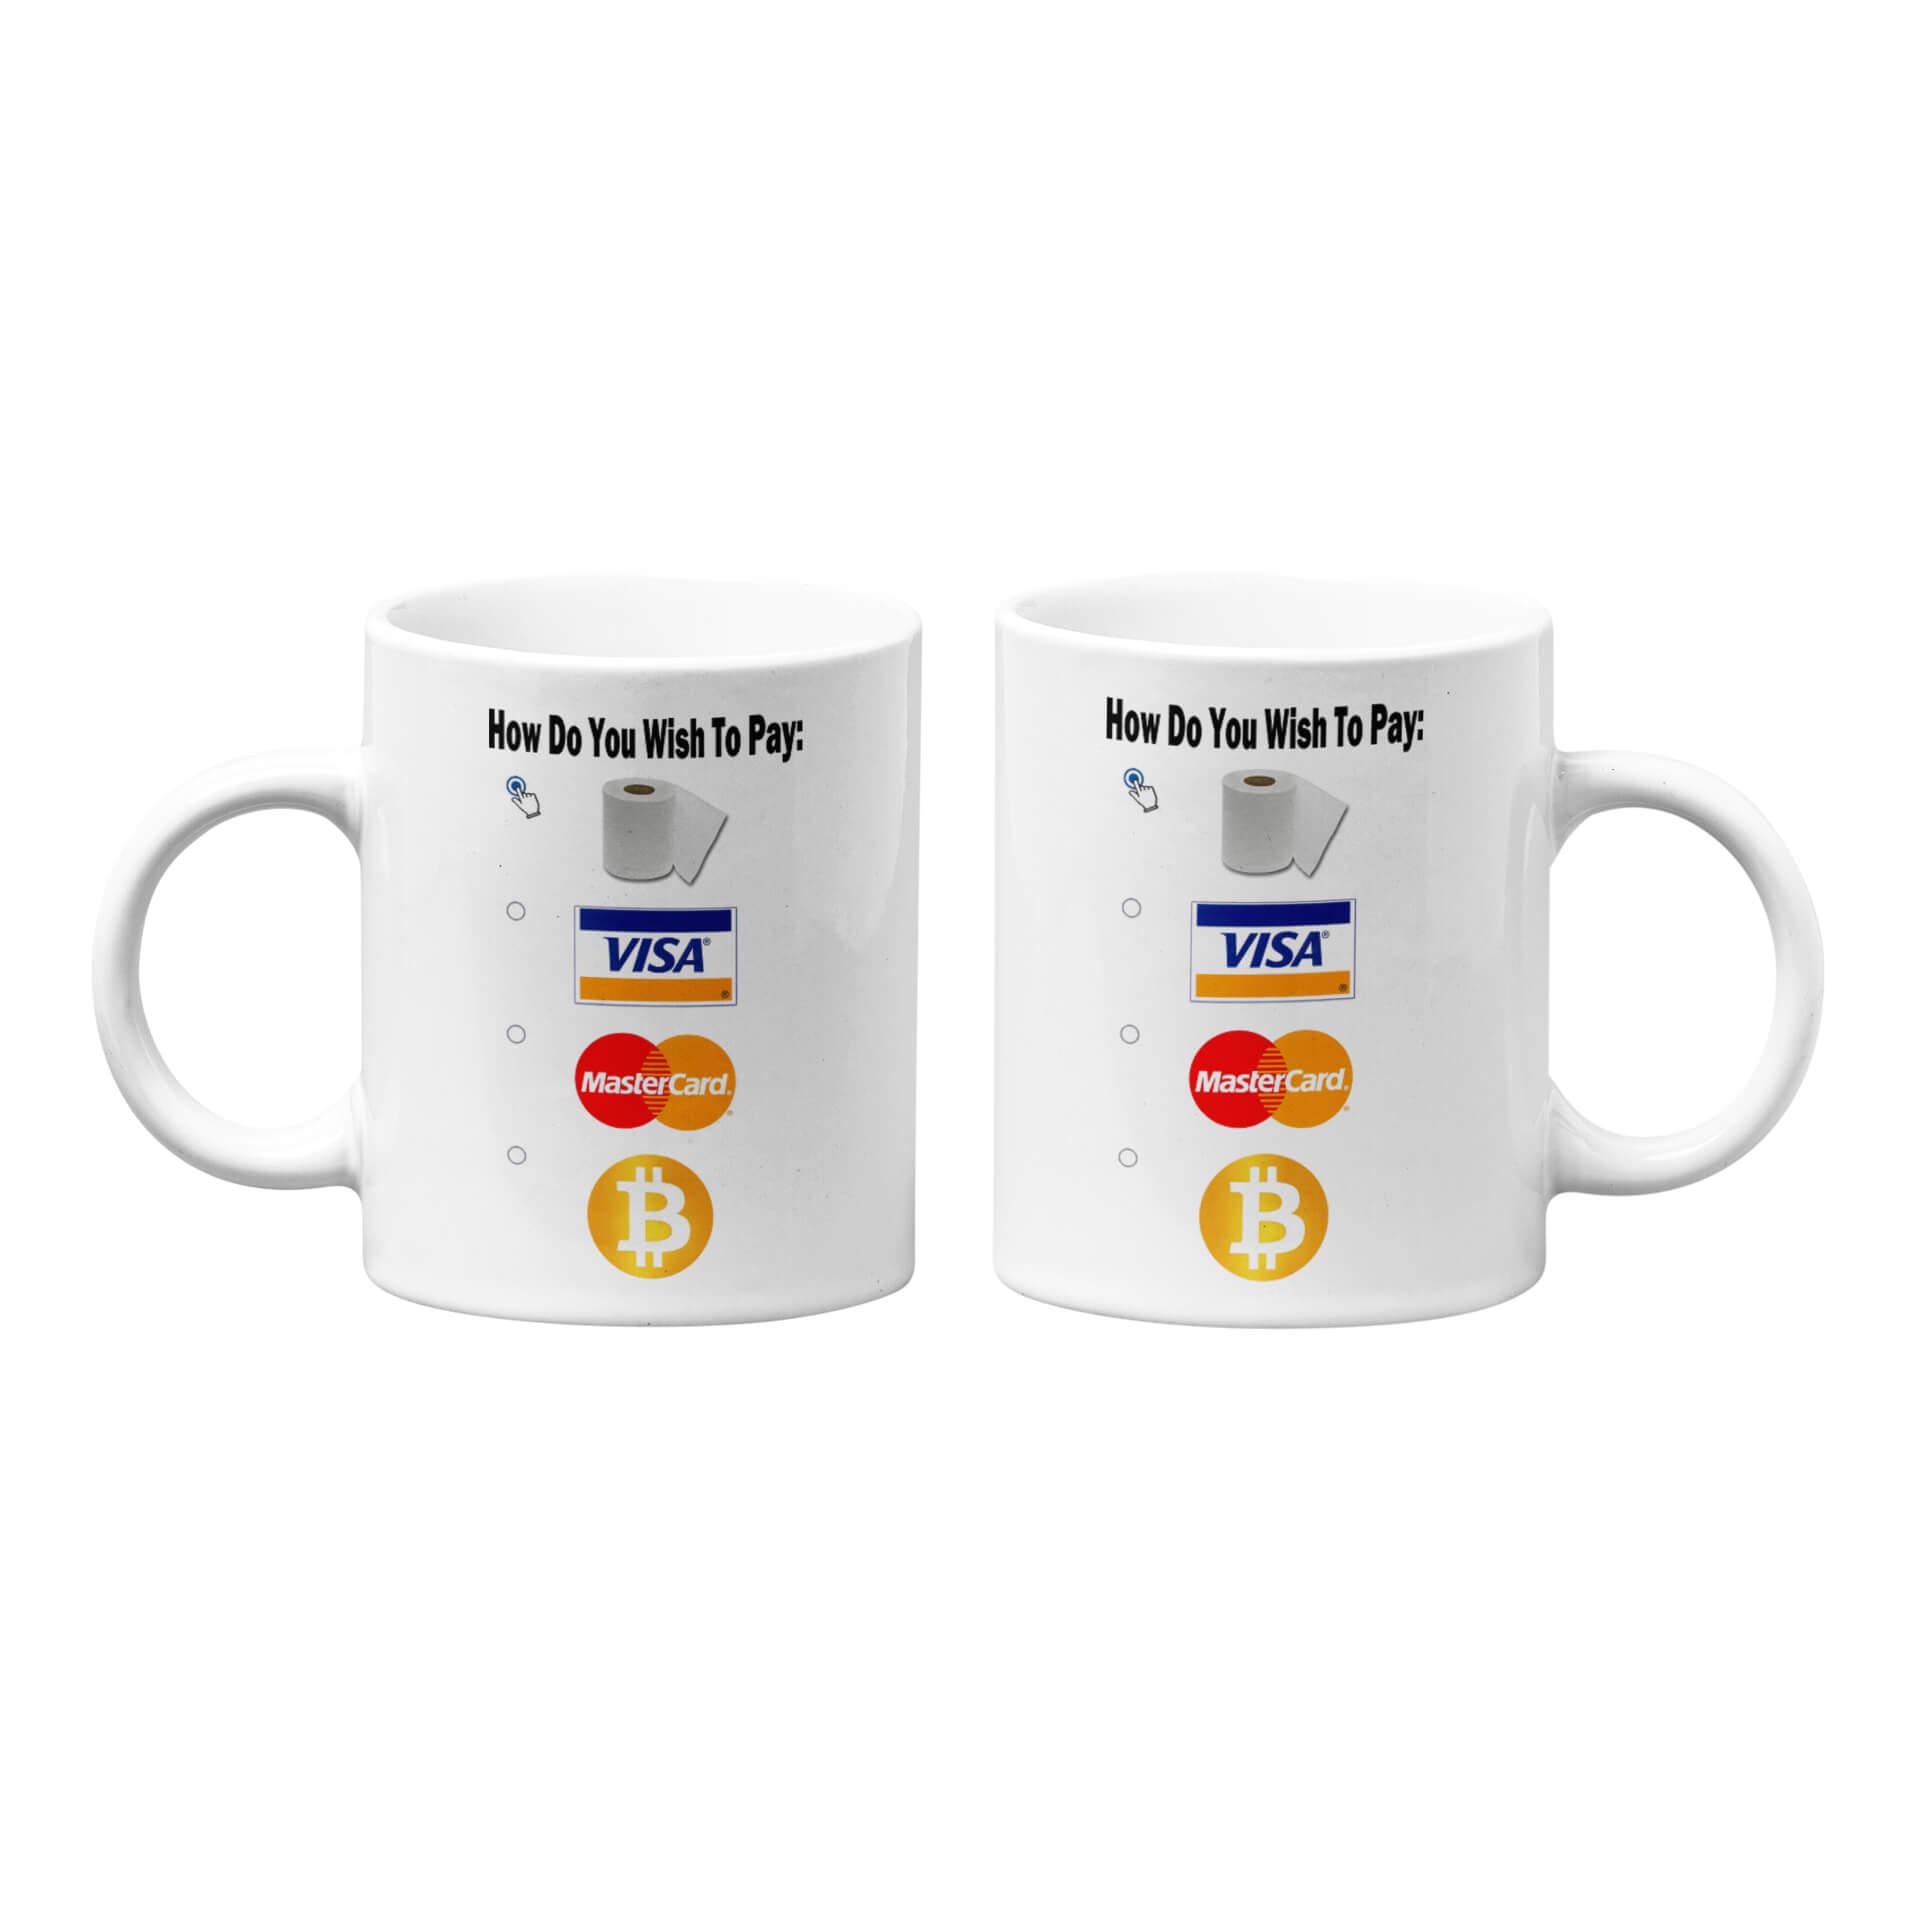 How Do You Wish To Pay Mug